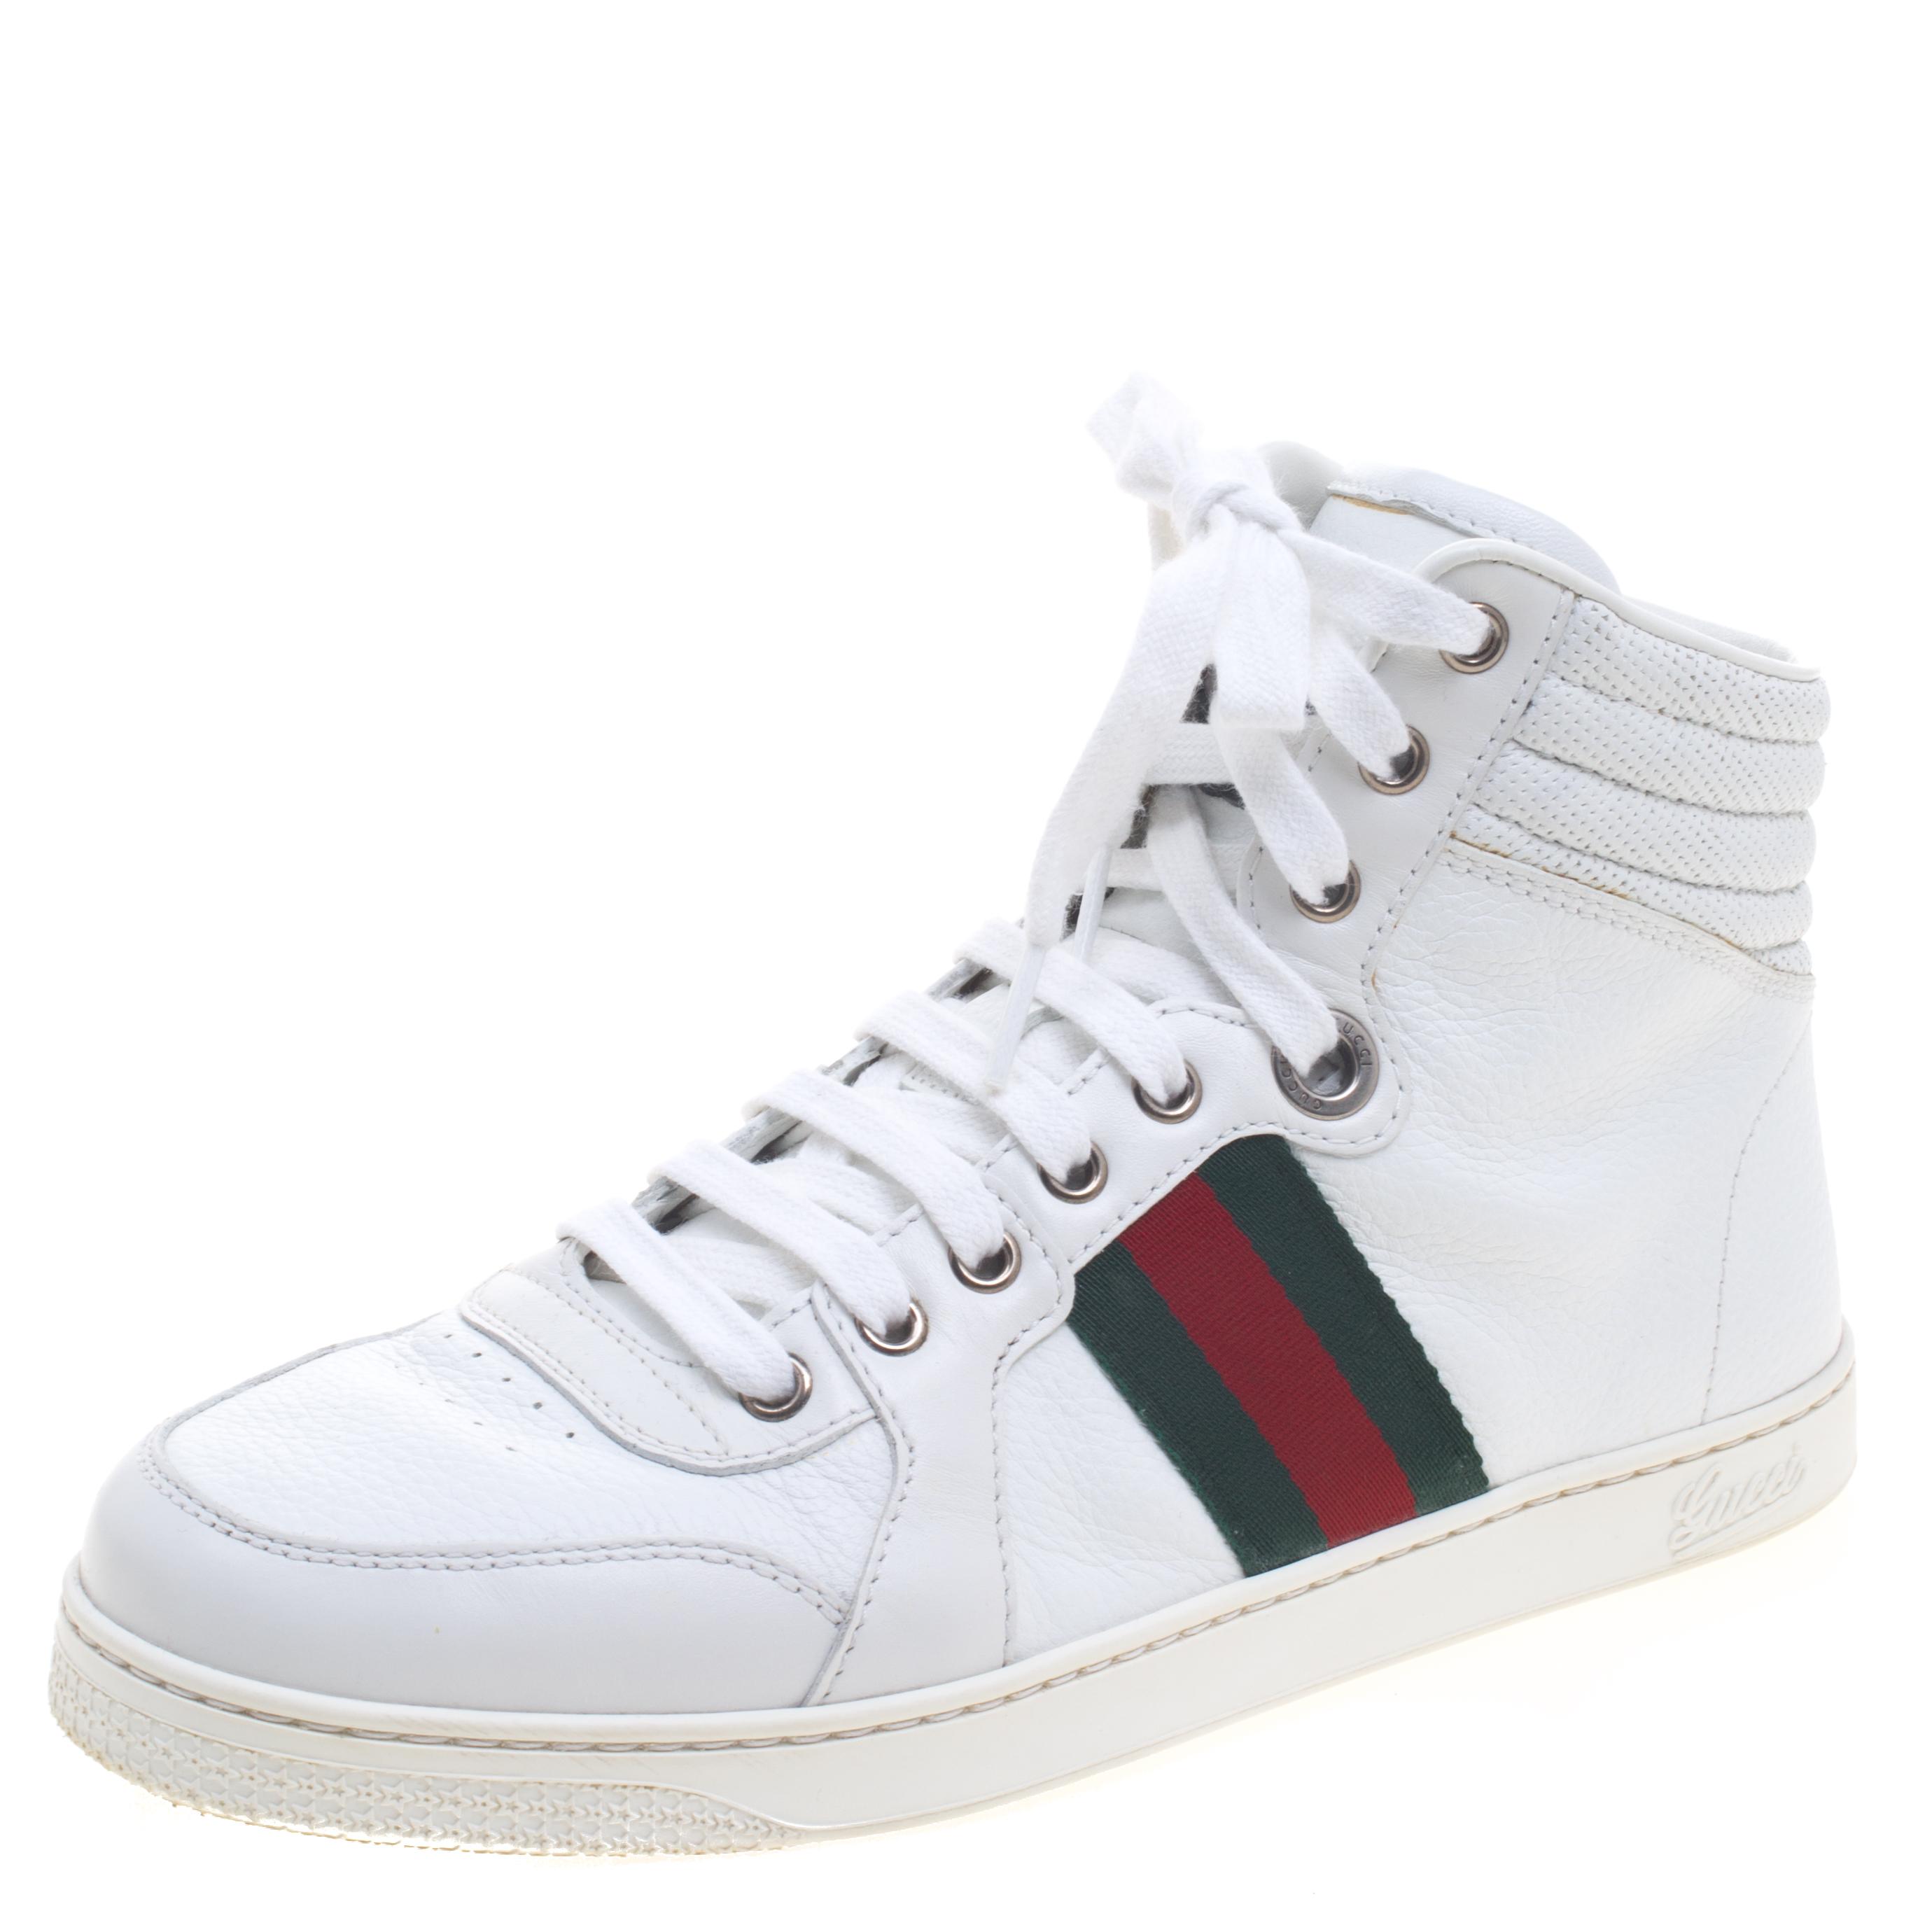 e74c7d5de9568 ... Gucci White Leather Web Detail High Top Sneakers Size 40. nextprev.  prevnext